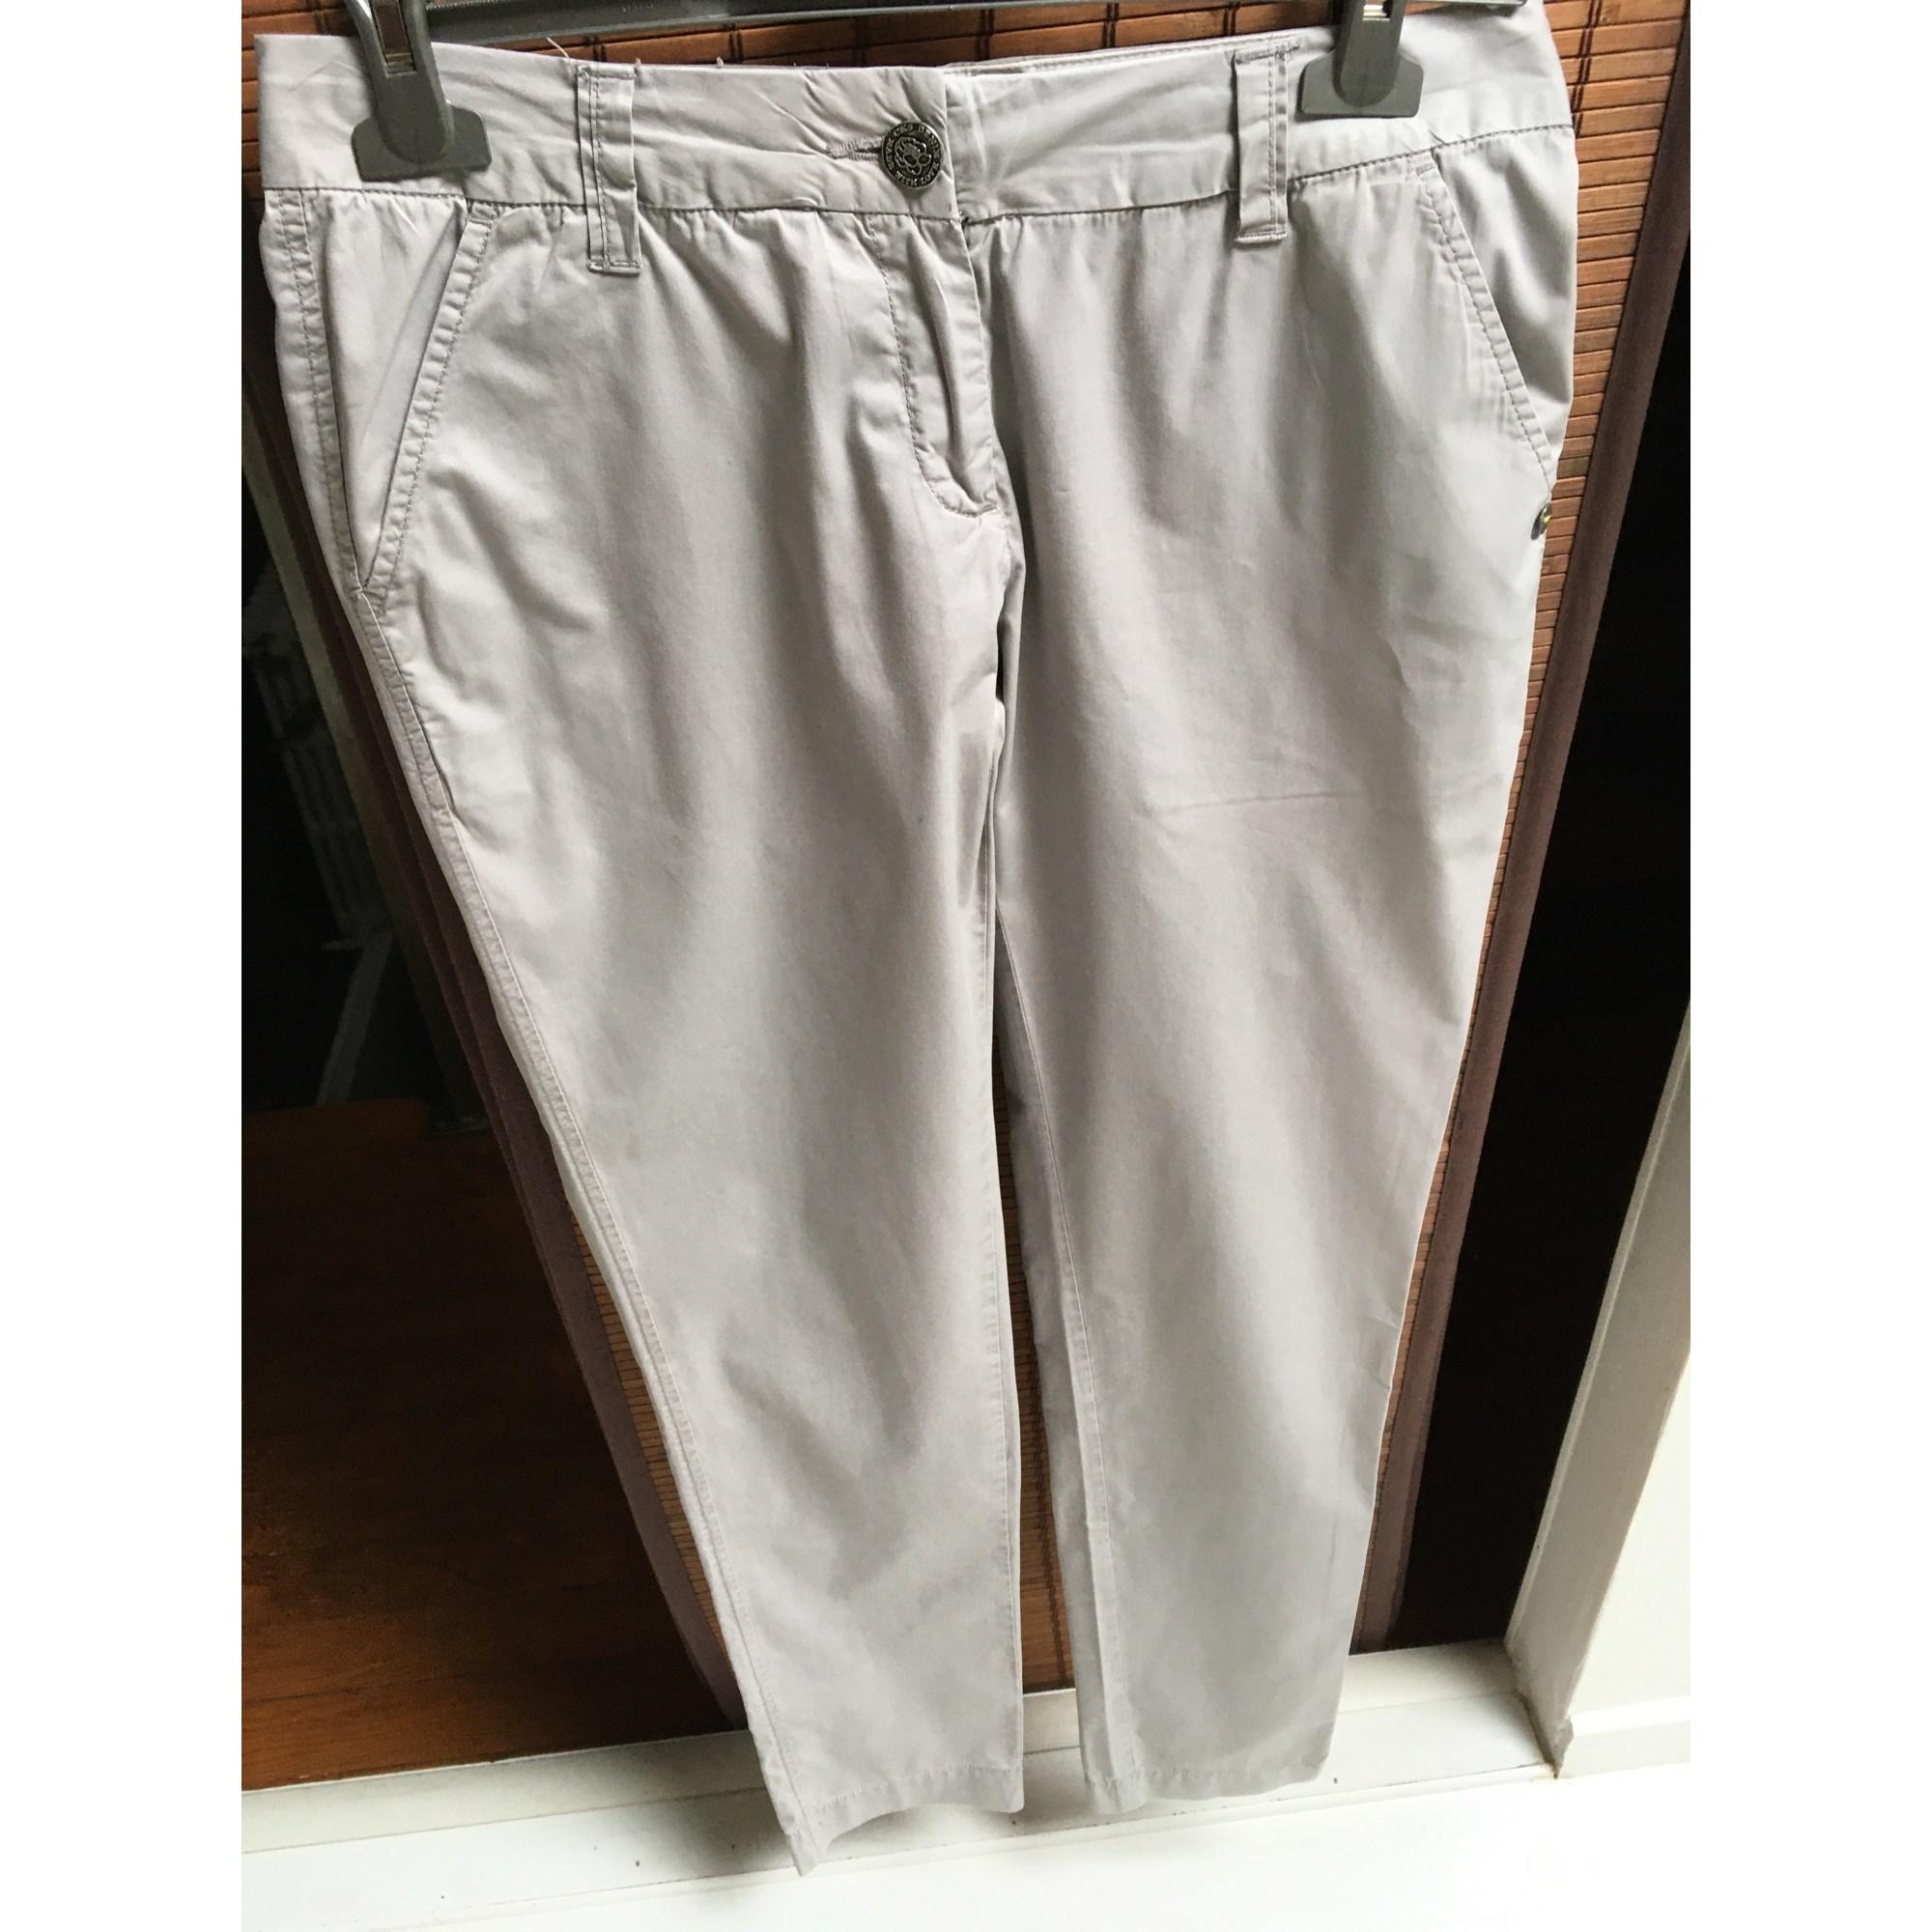 Pantalon droit CKS Beige, camel